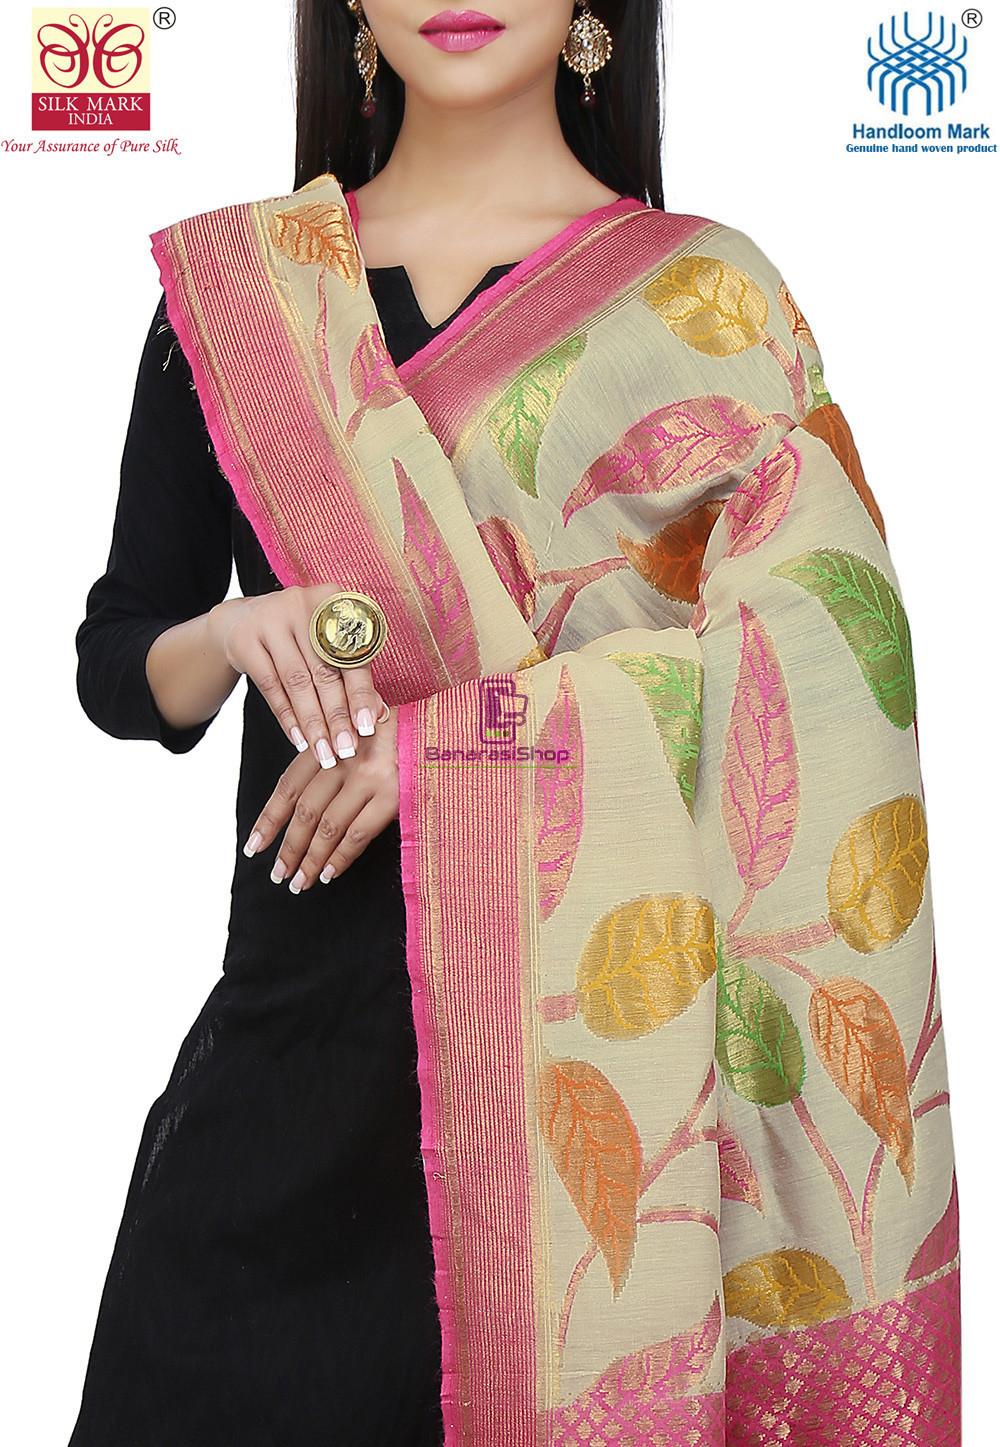 Handloom Banarasi Pure Muga Silk Dupatta in Light Beige and Pink 2